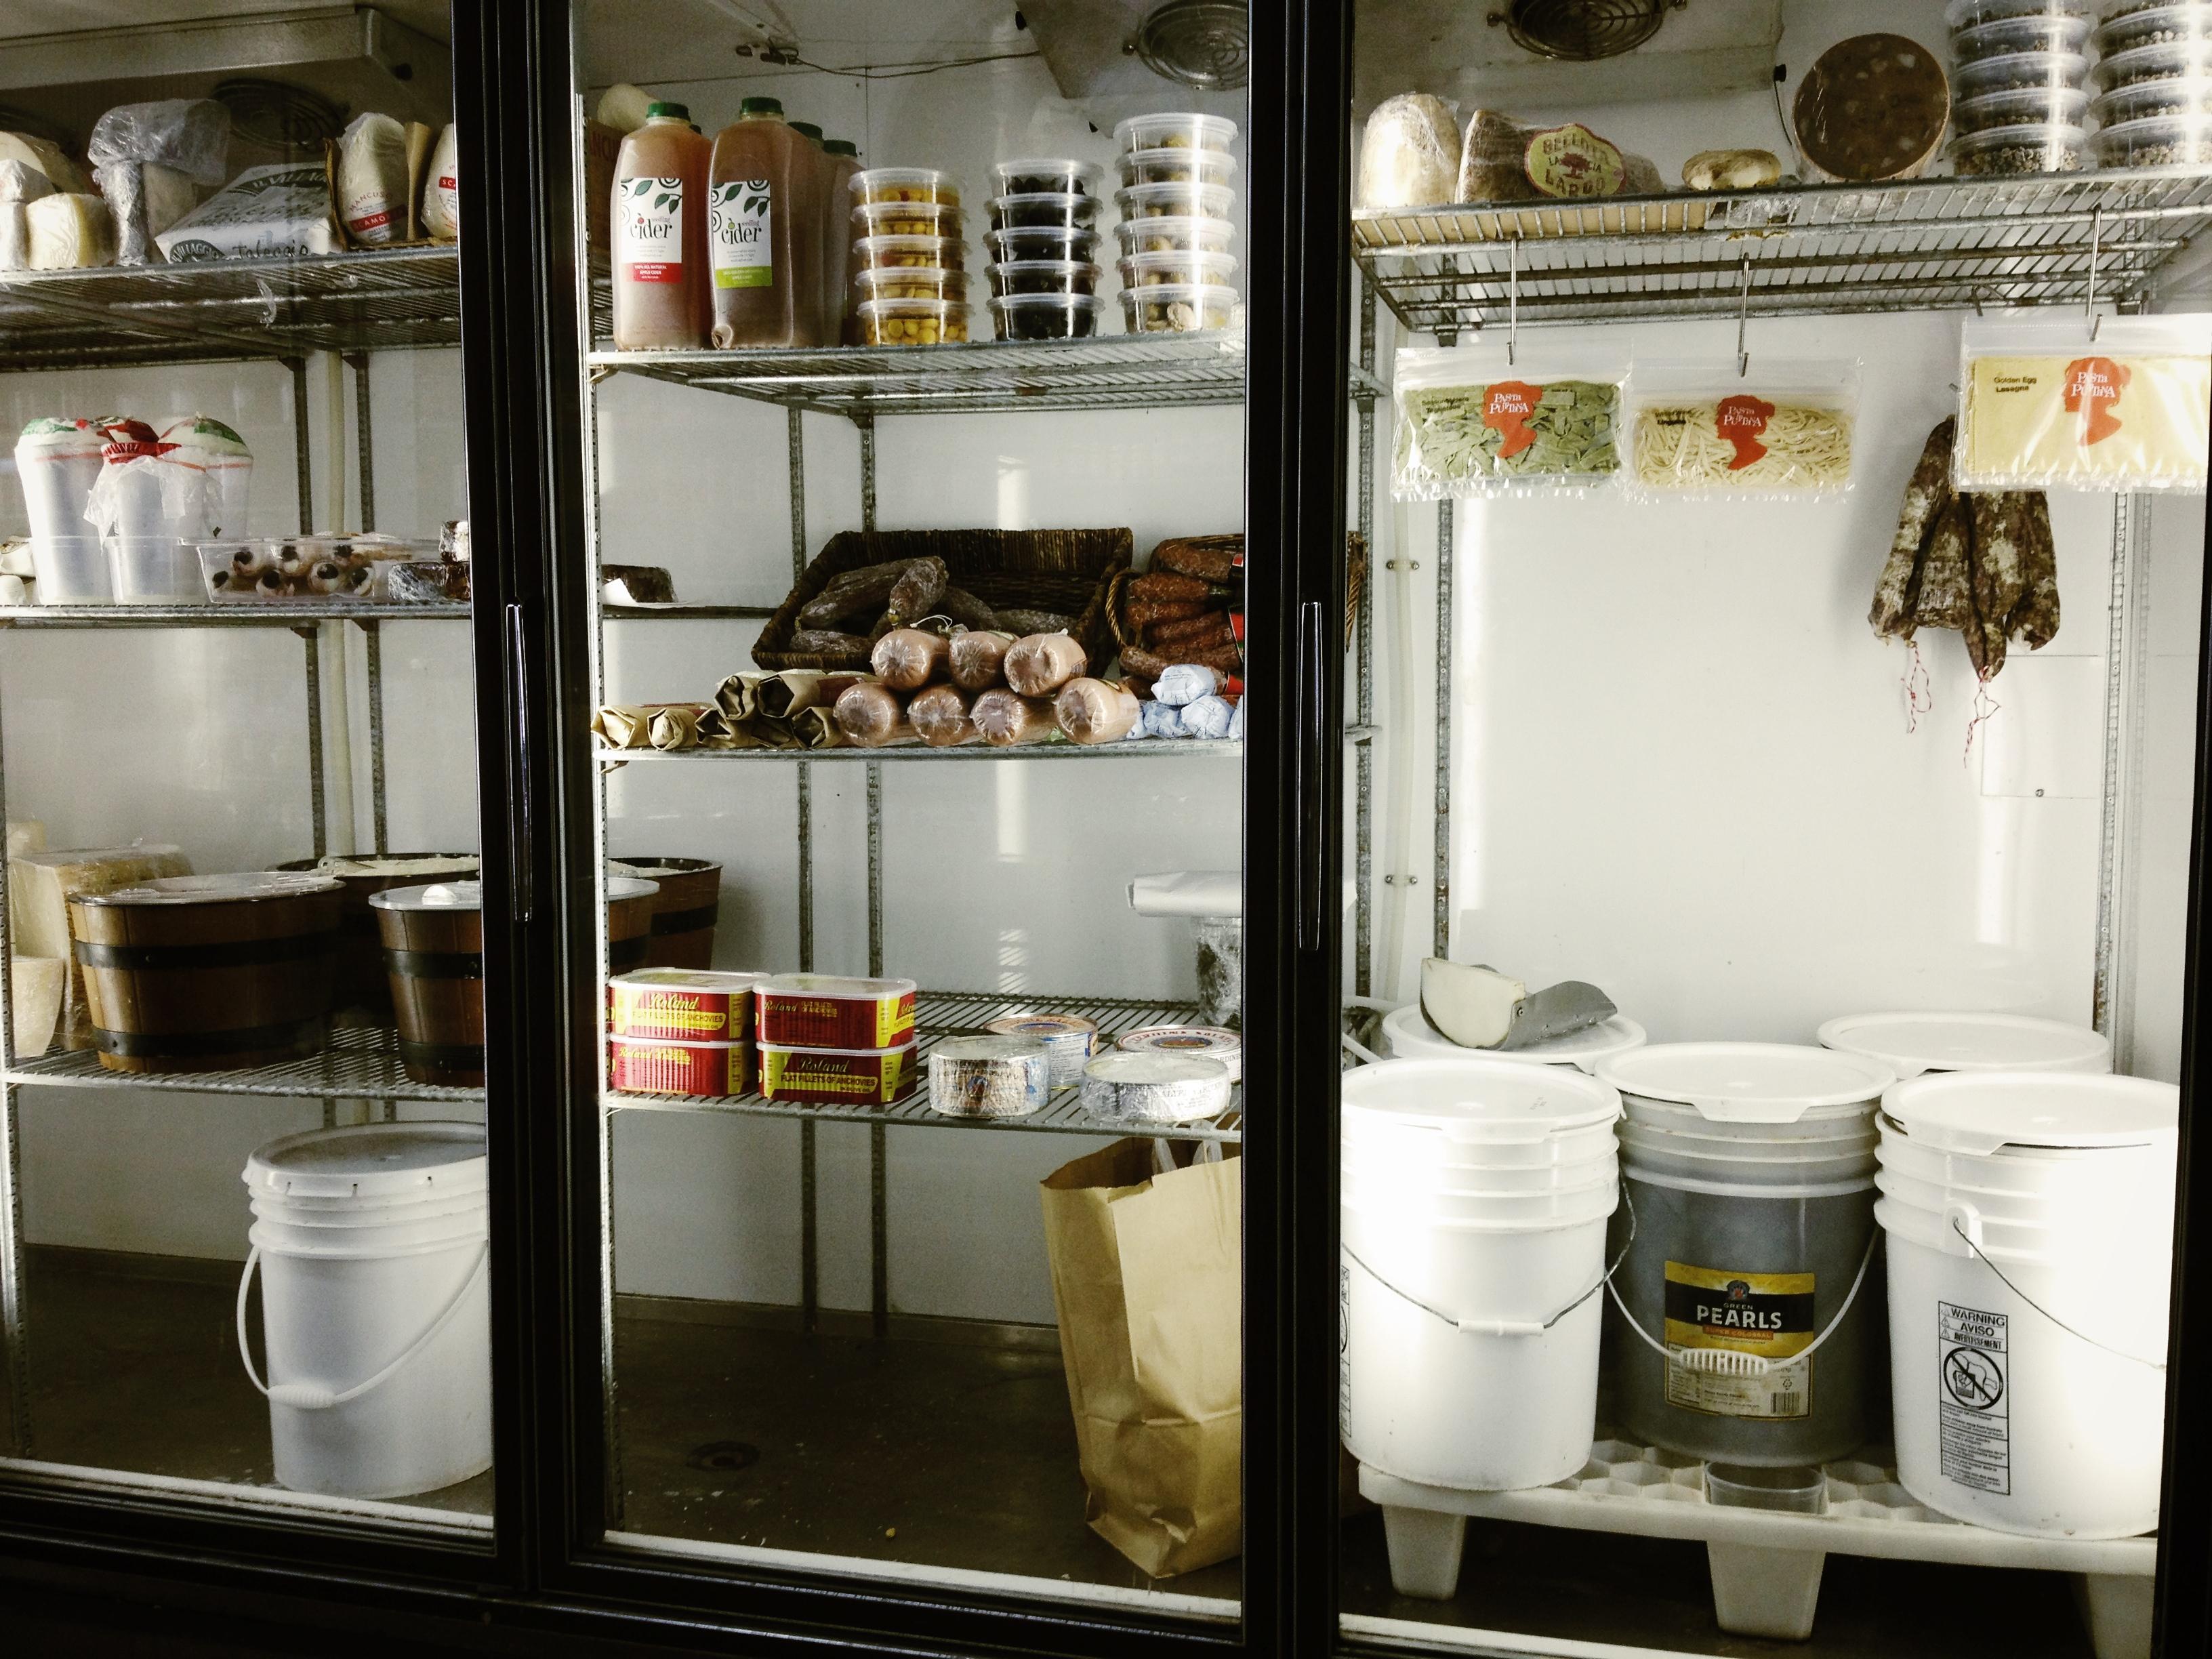 J.P. Graziano Grocery store